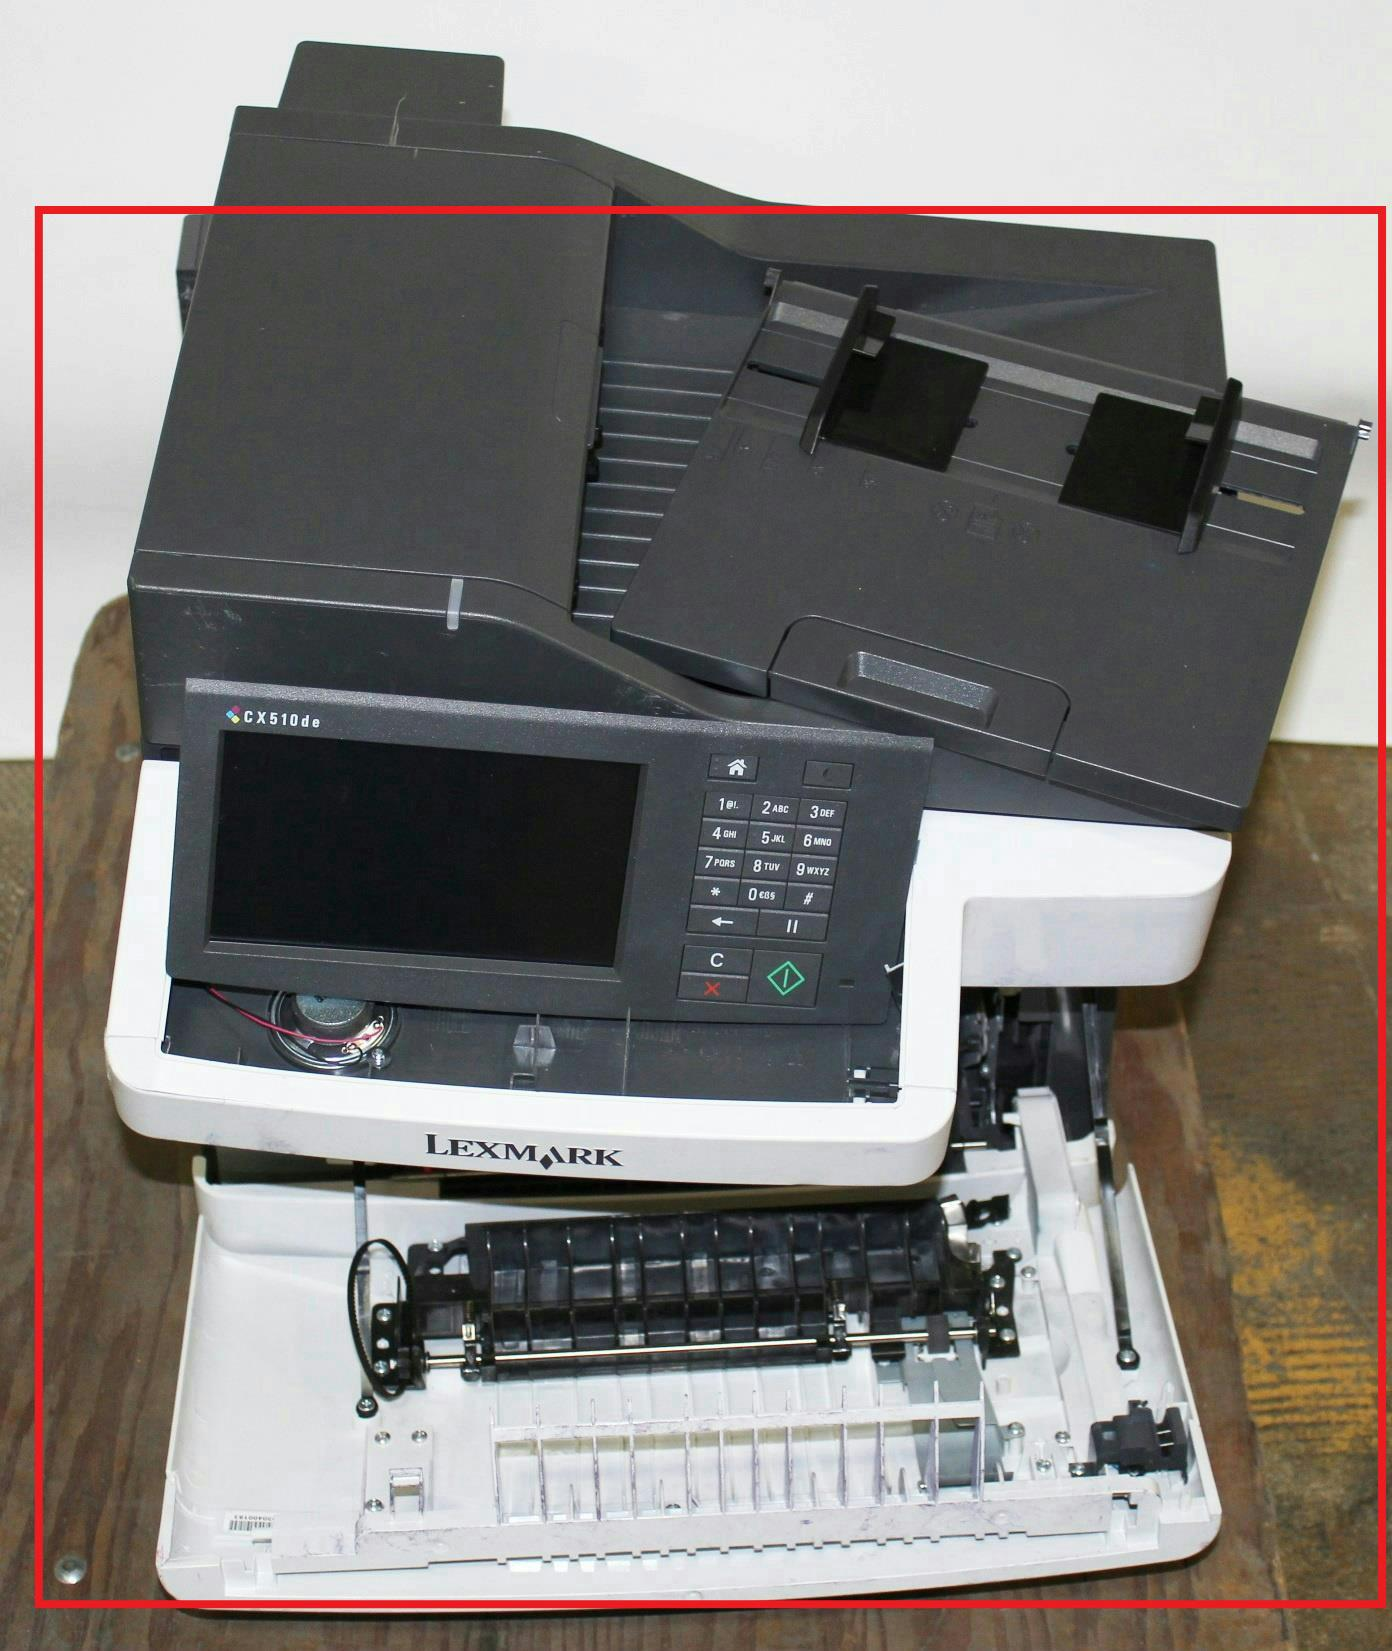 Lexmark CX510 MFP XPS v4 64 BIT Driver